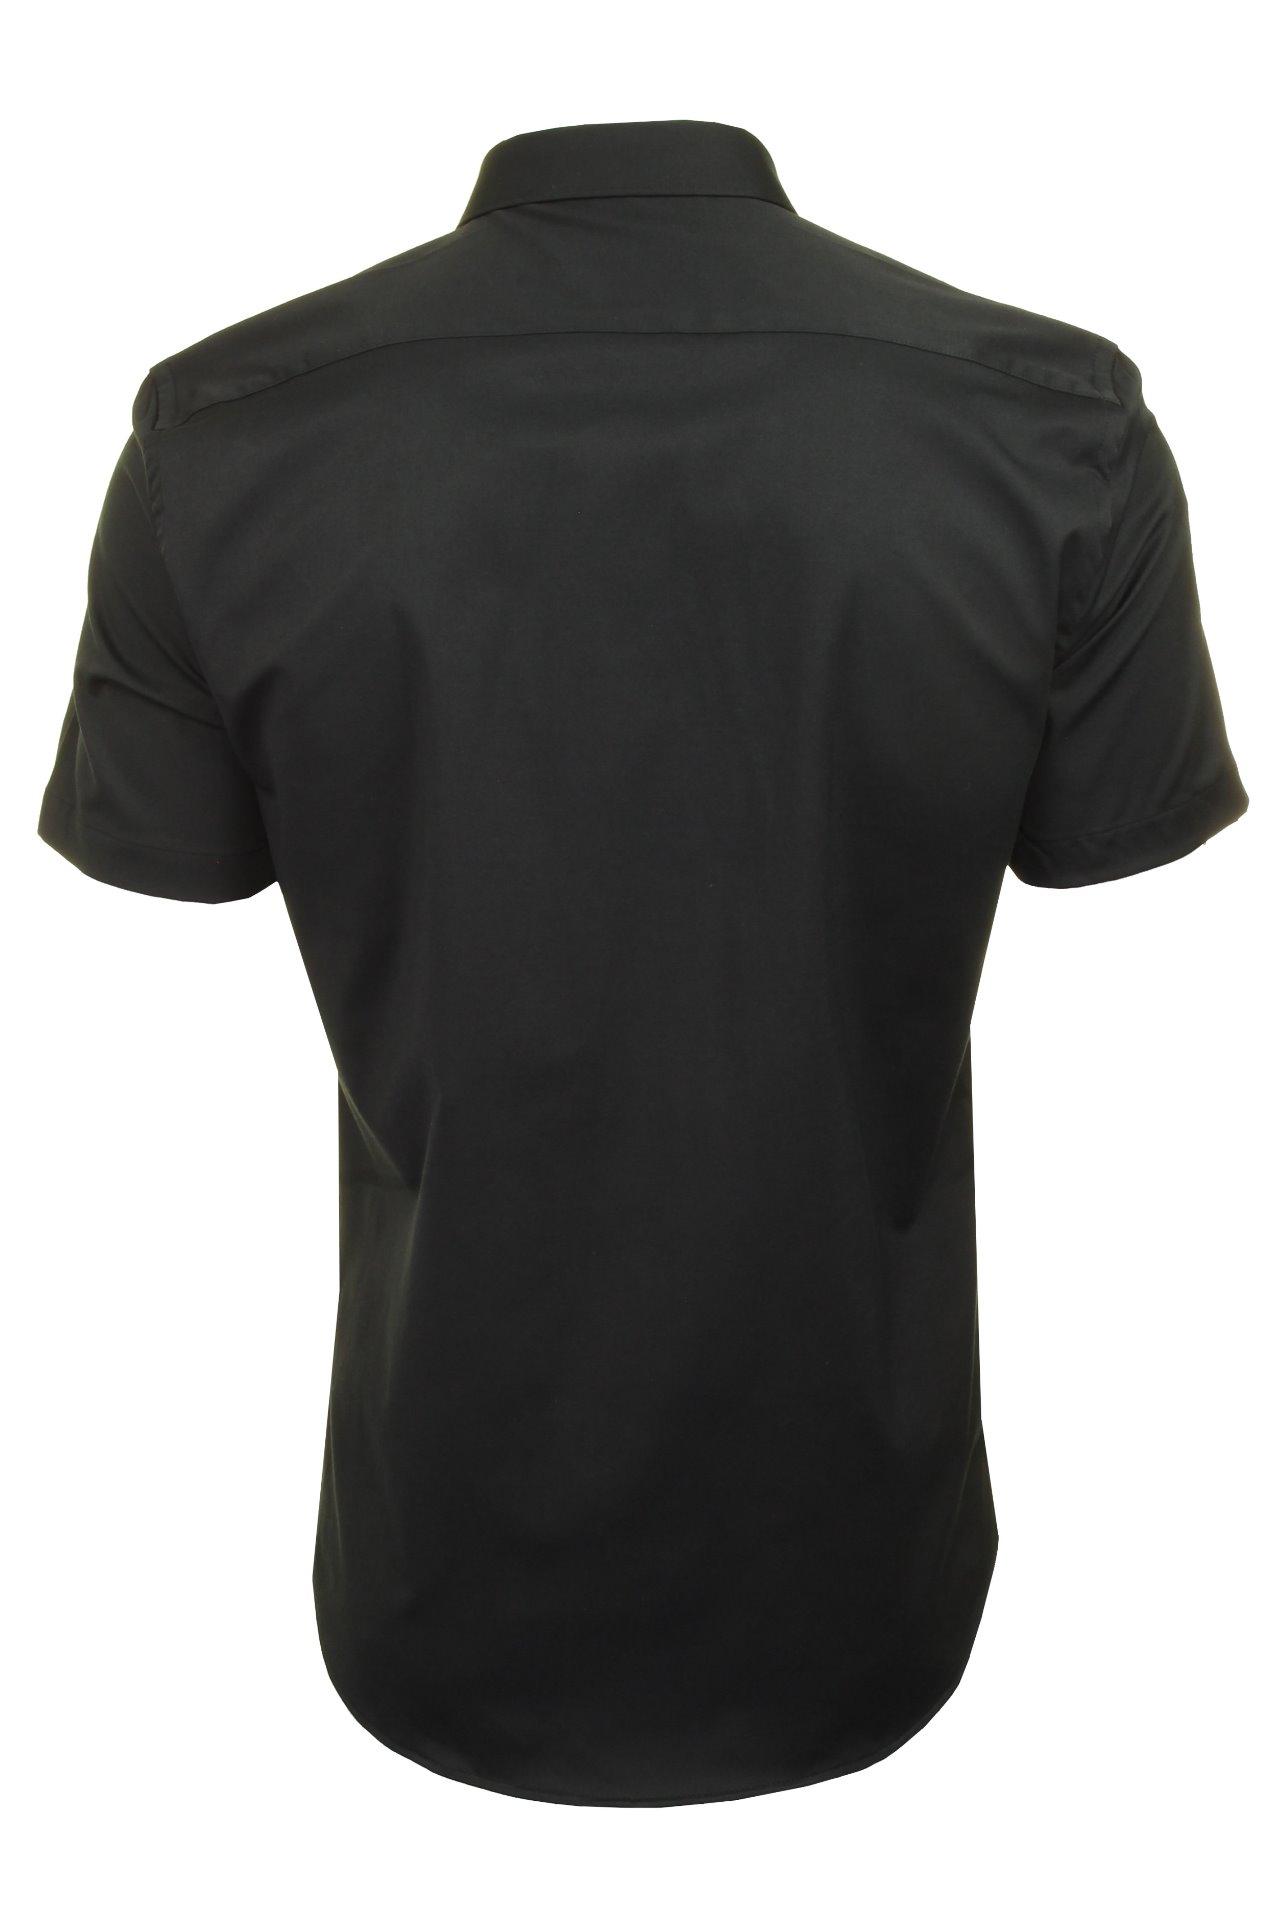 Xact-para-Hombre-de-Manga-Corta-Camisa-Slim-Fit-Popelin-del-estiramiento miniatura 6